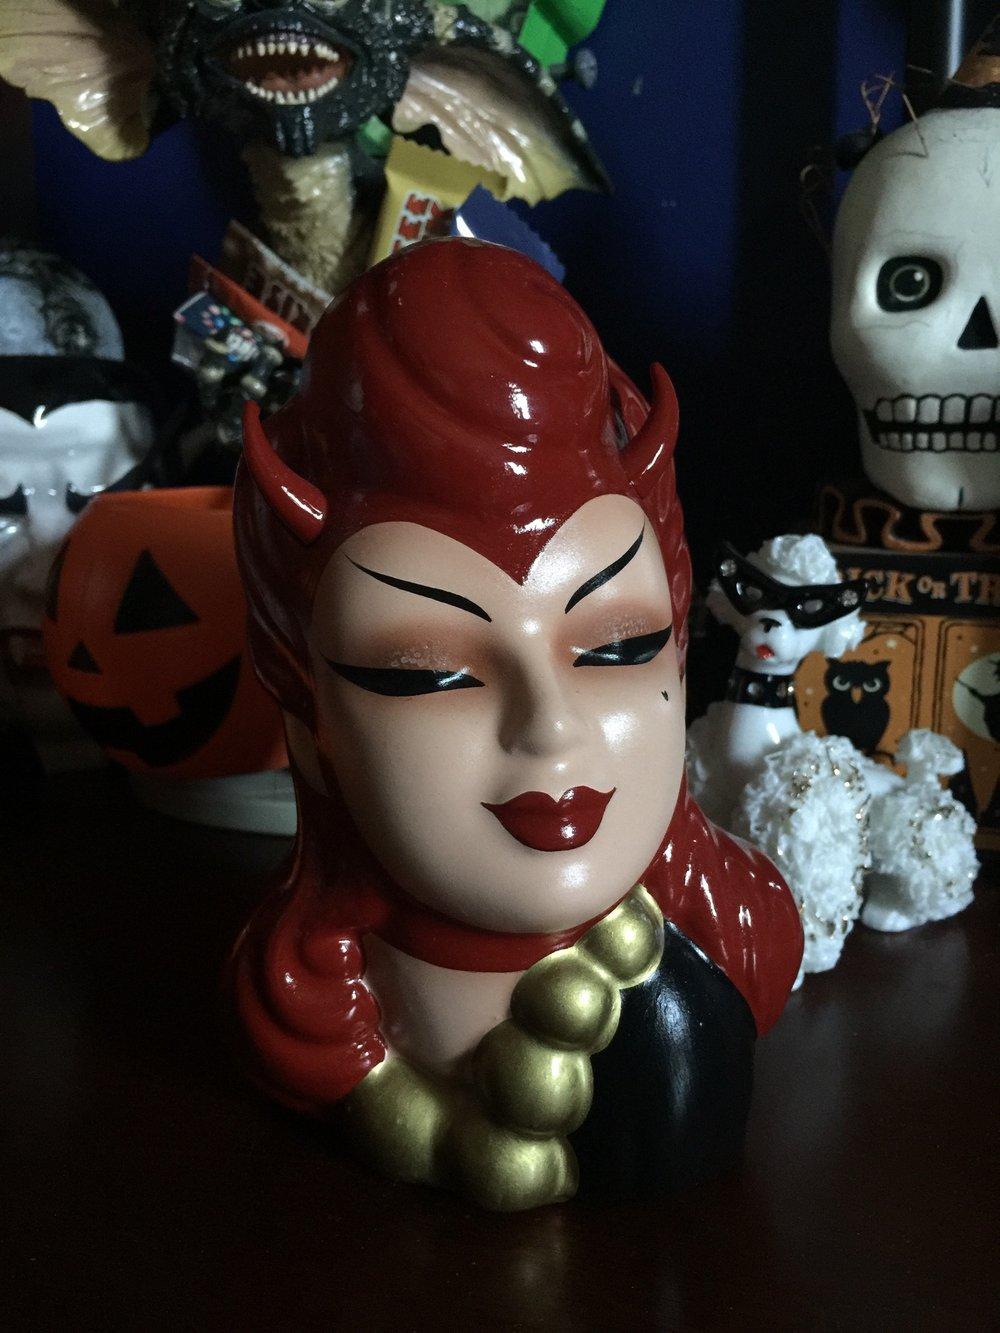 Image of Vintage Revamped Devil Head Vase